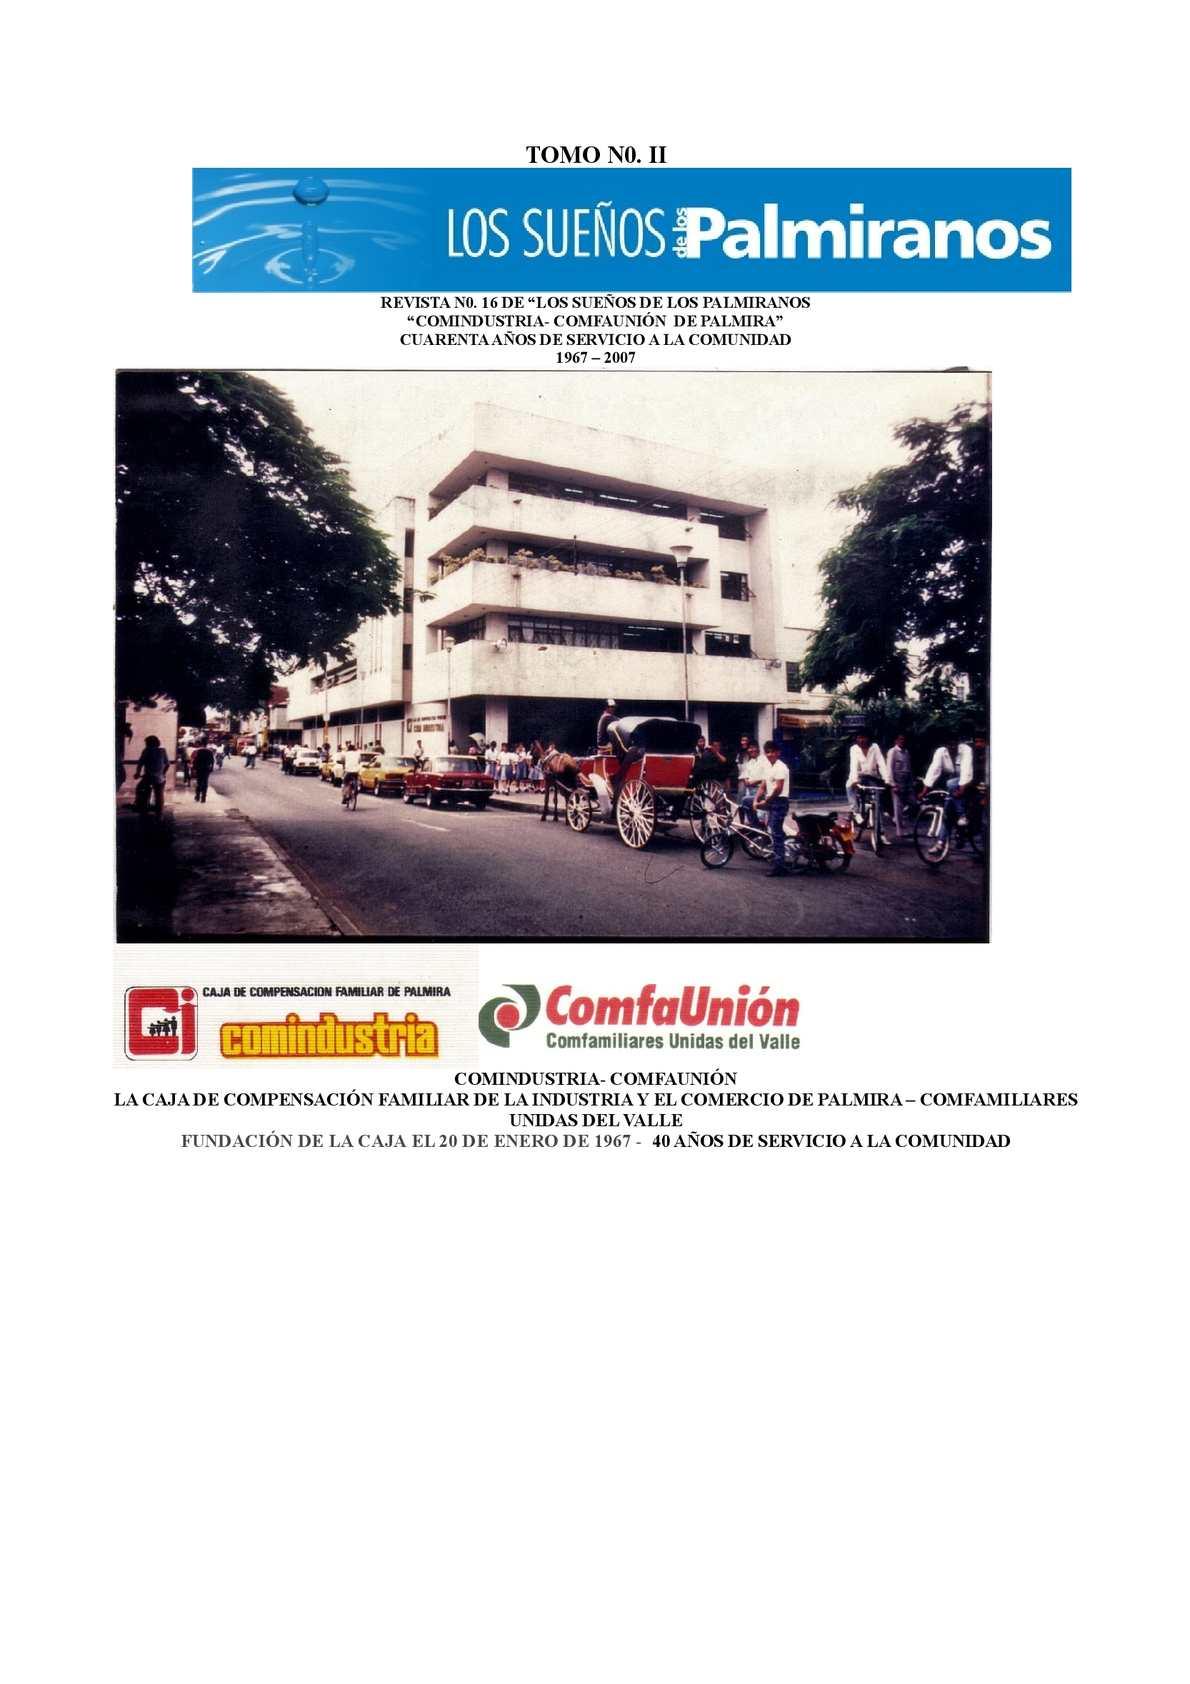 Calam O Revista N0 16 Tomo Ii Comindustria Comfauni N  # Muebles Lozano Buga